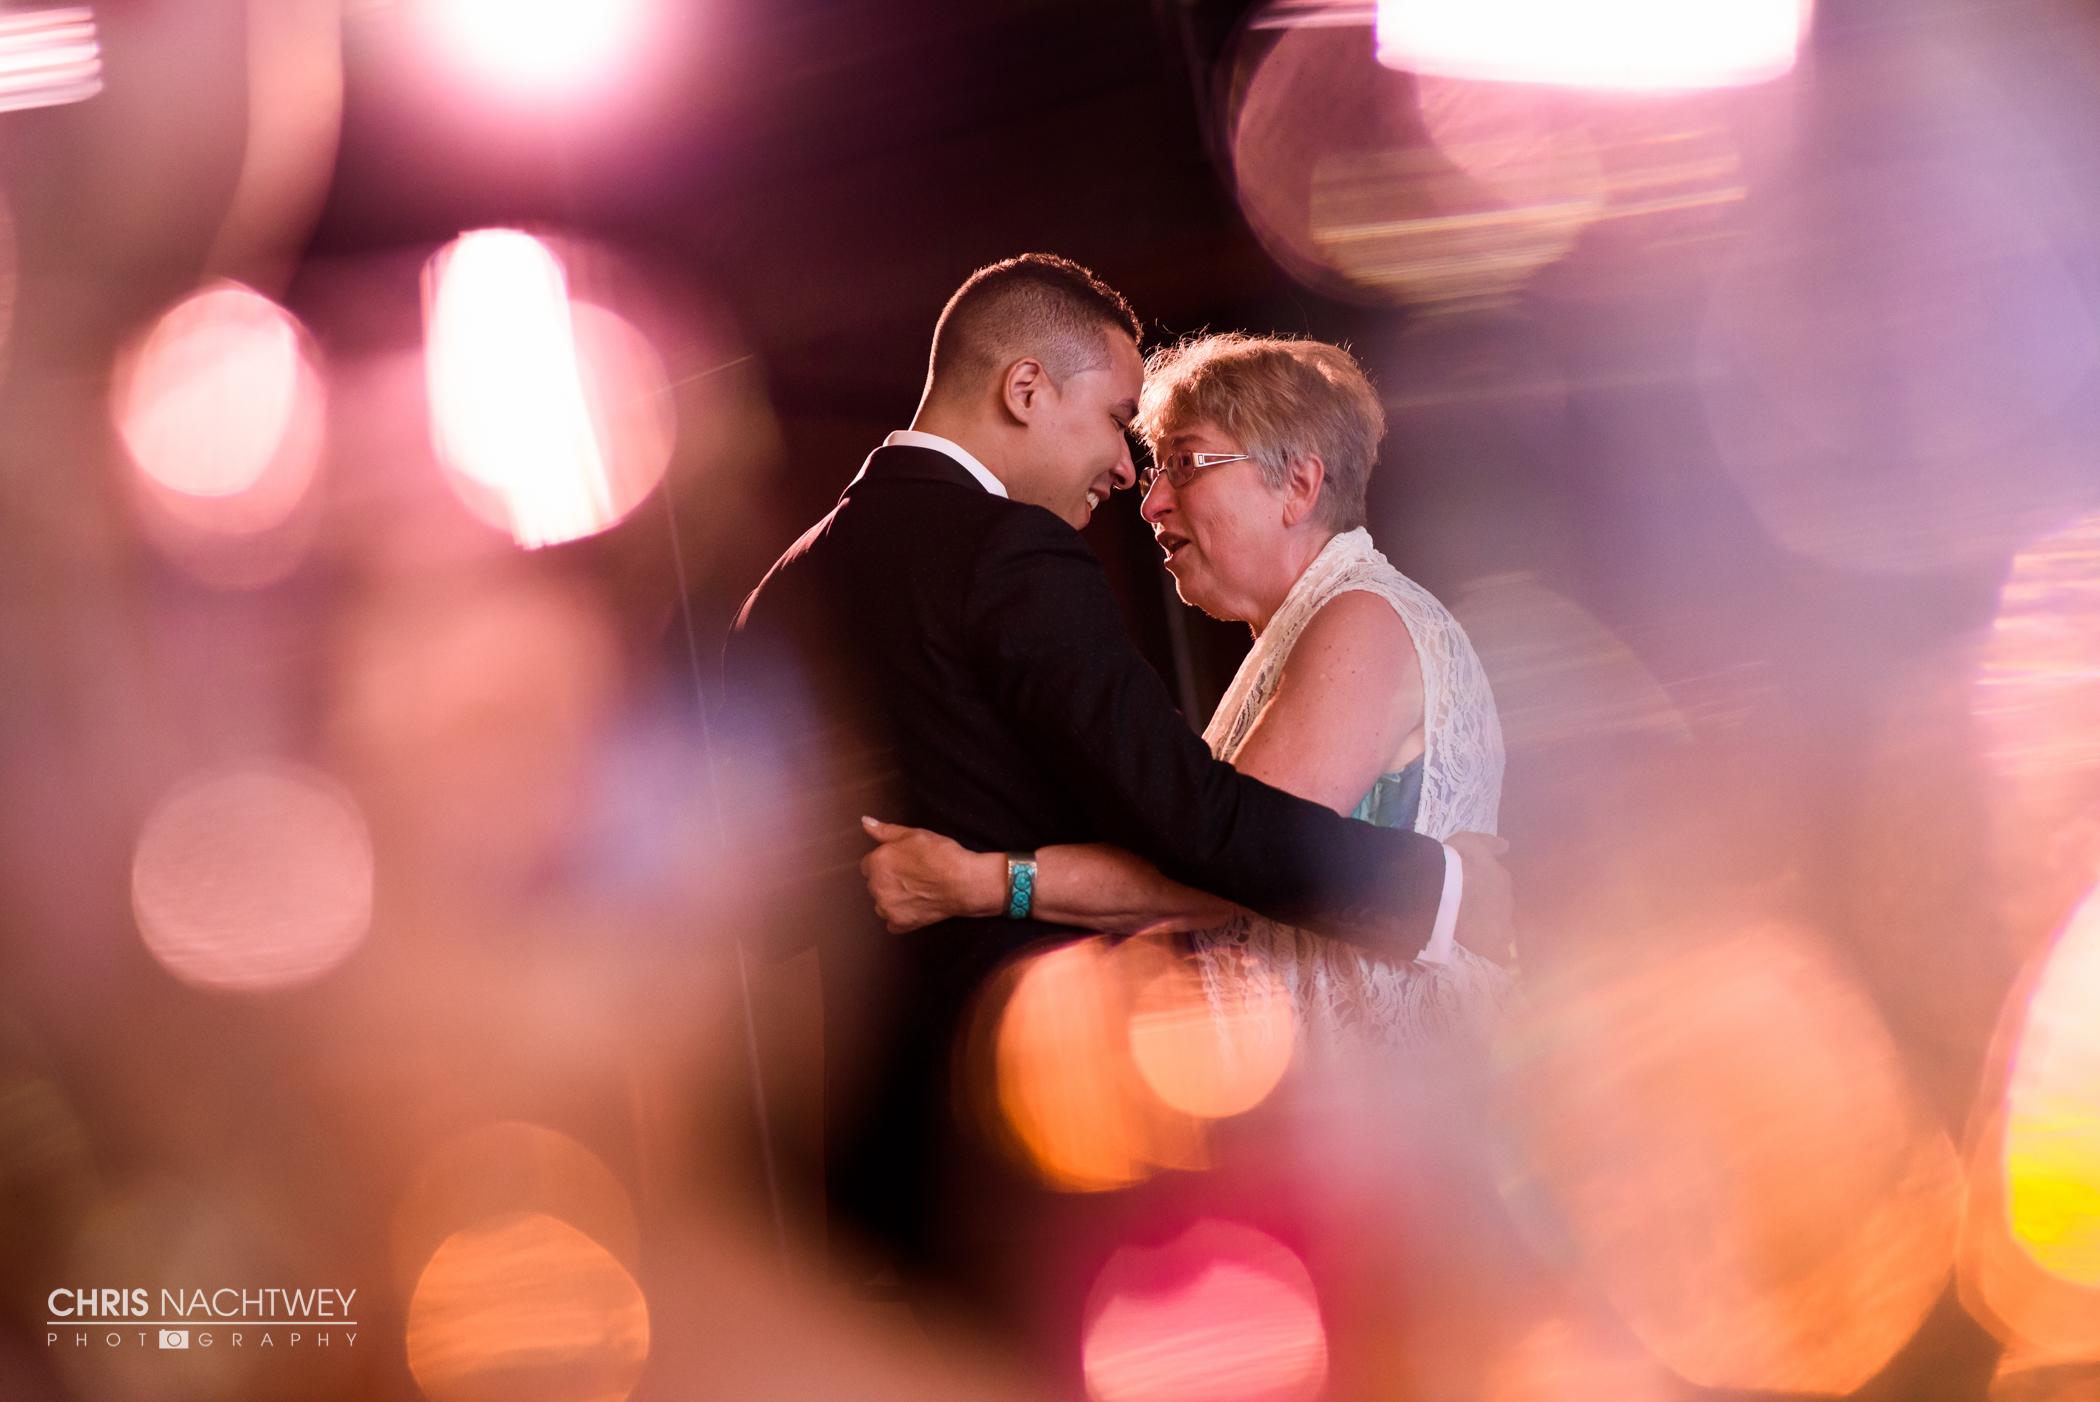 wedding-saltwater-farm-vineyard-photos-stonington-ct-chris-nachtwey-photography-2016-ana-austin-40.jpg